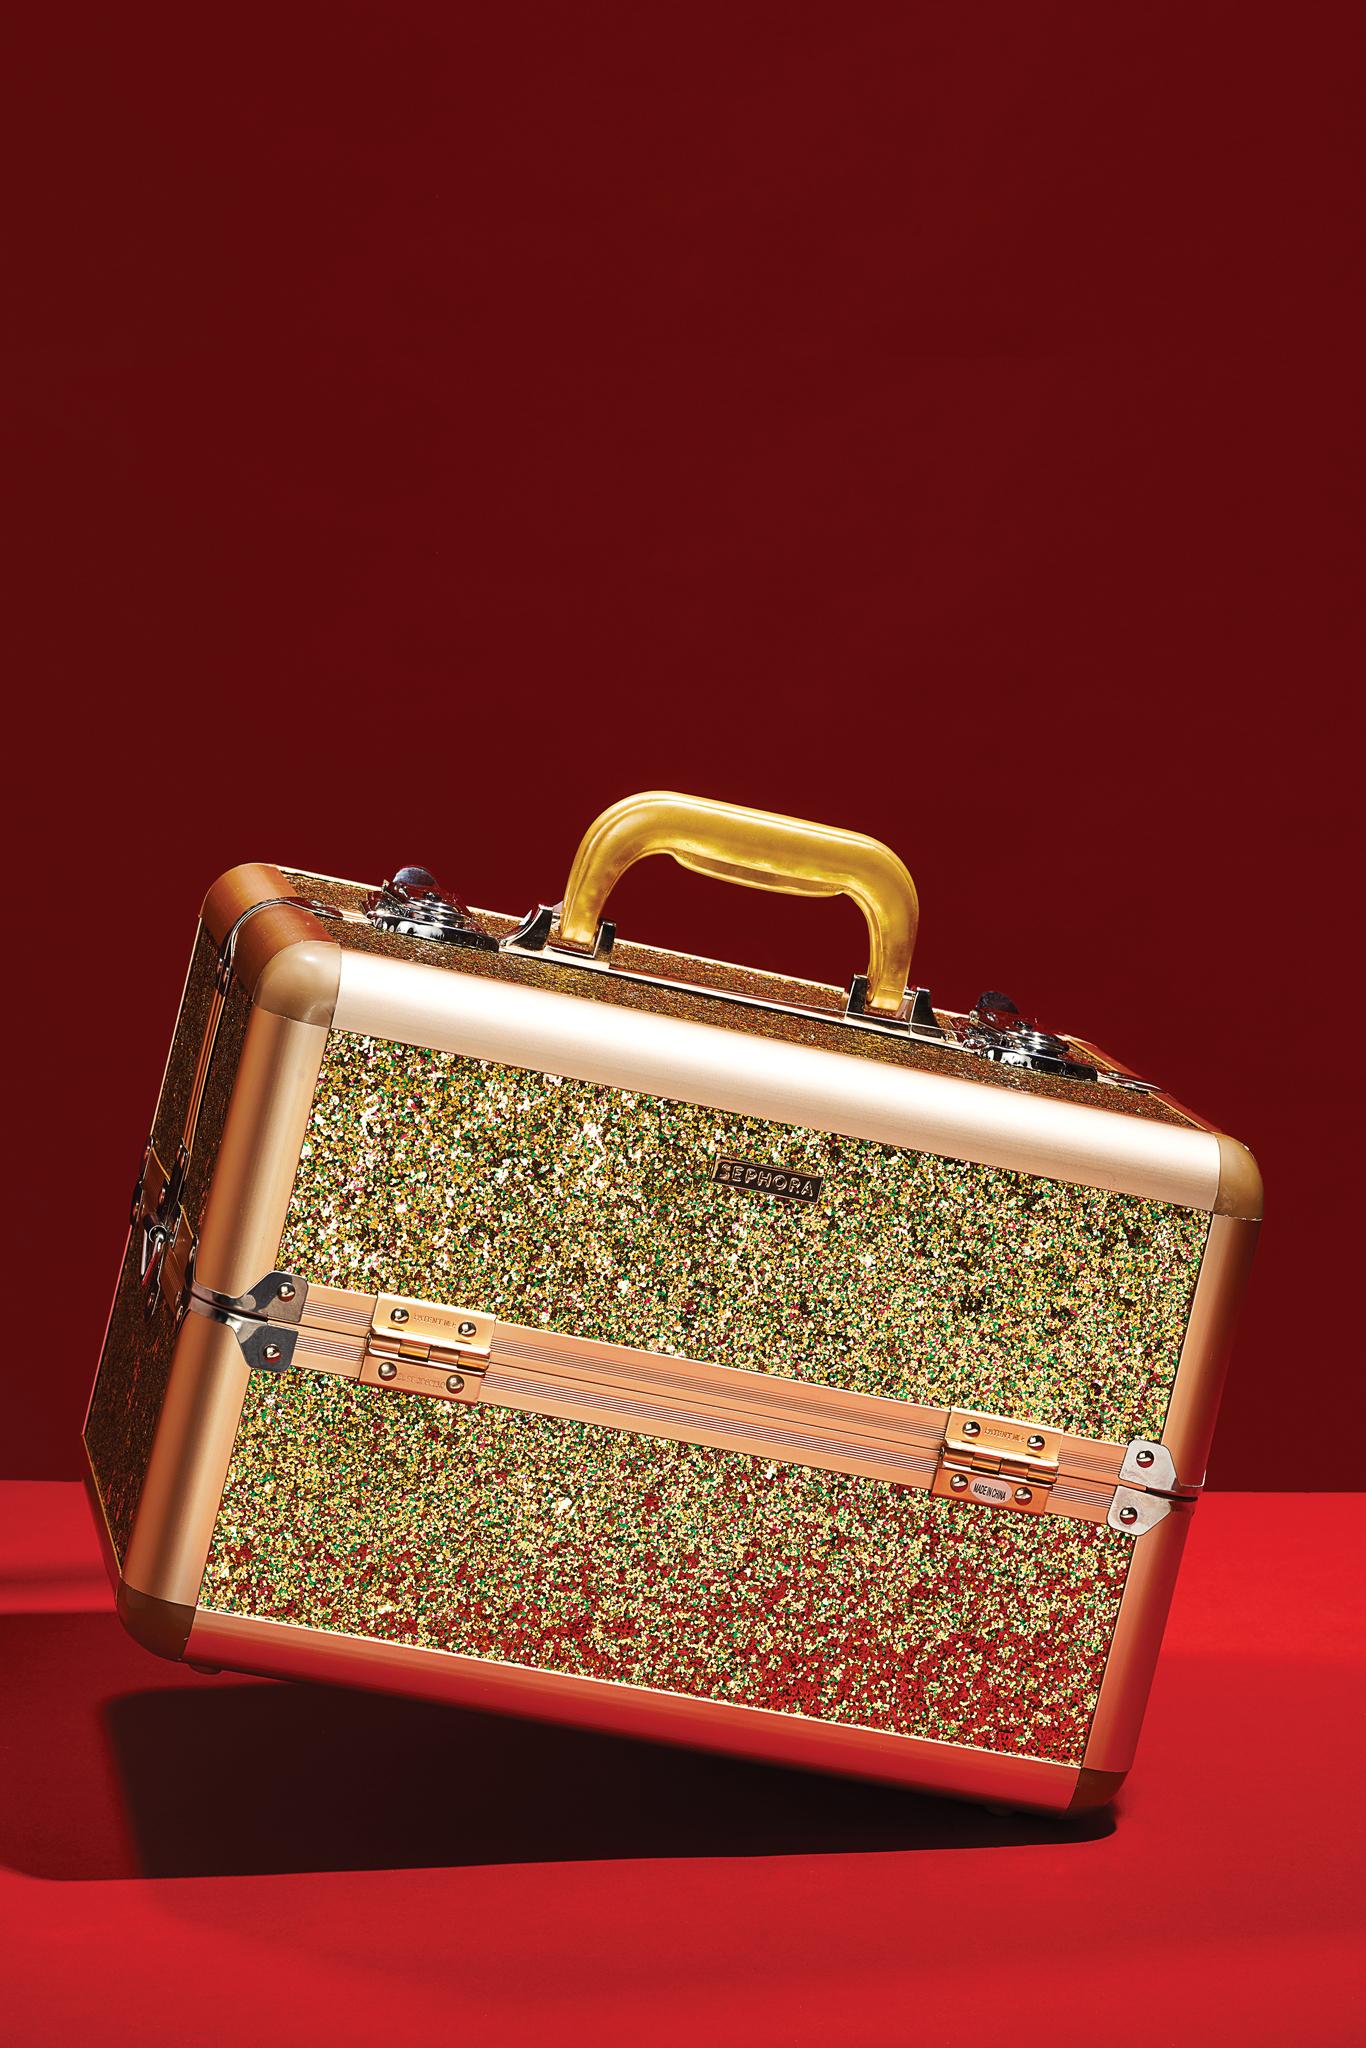 Sephora Collection Precious Elements Traincase